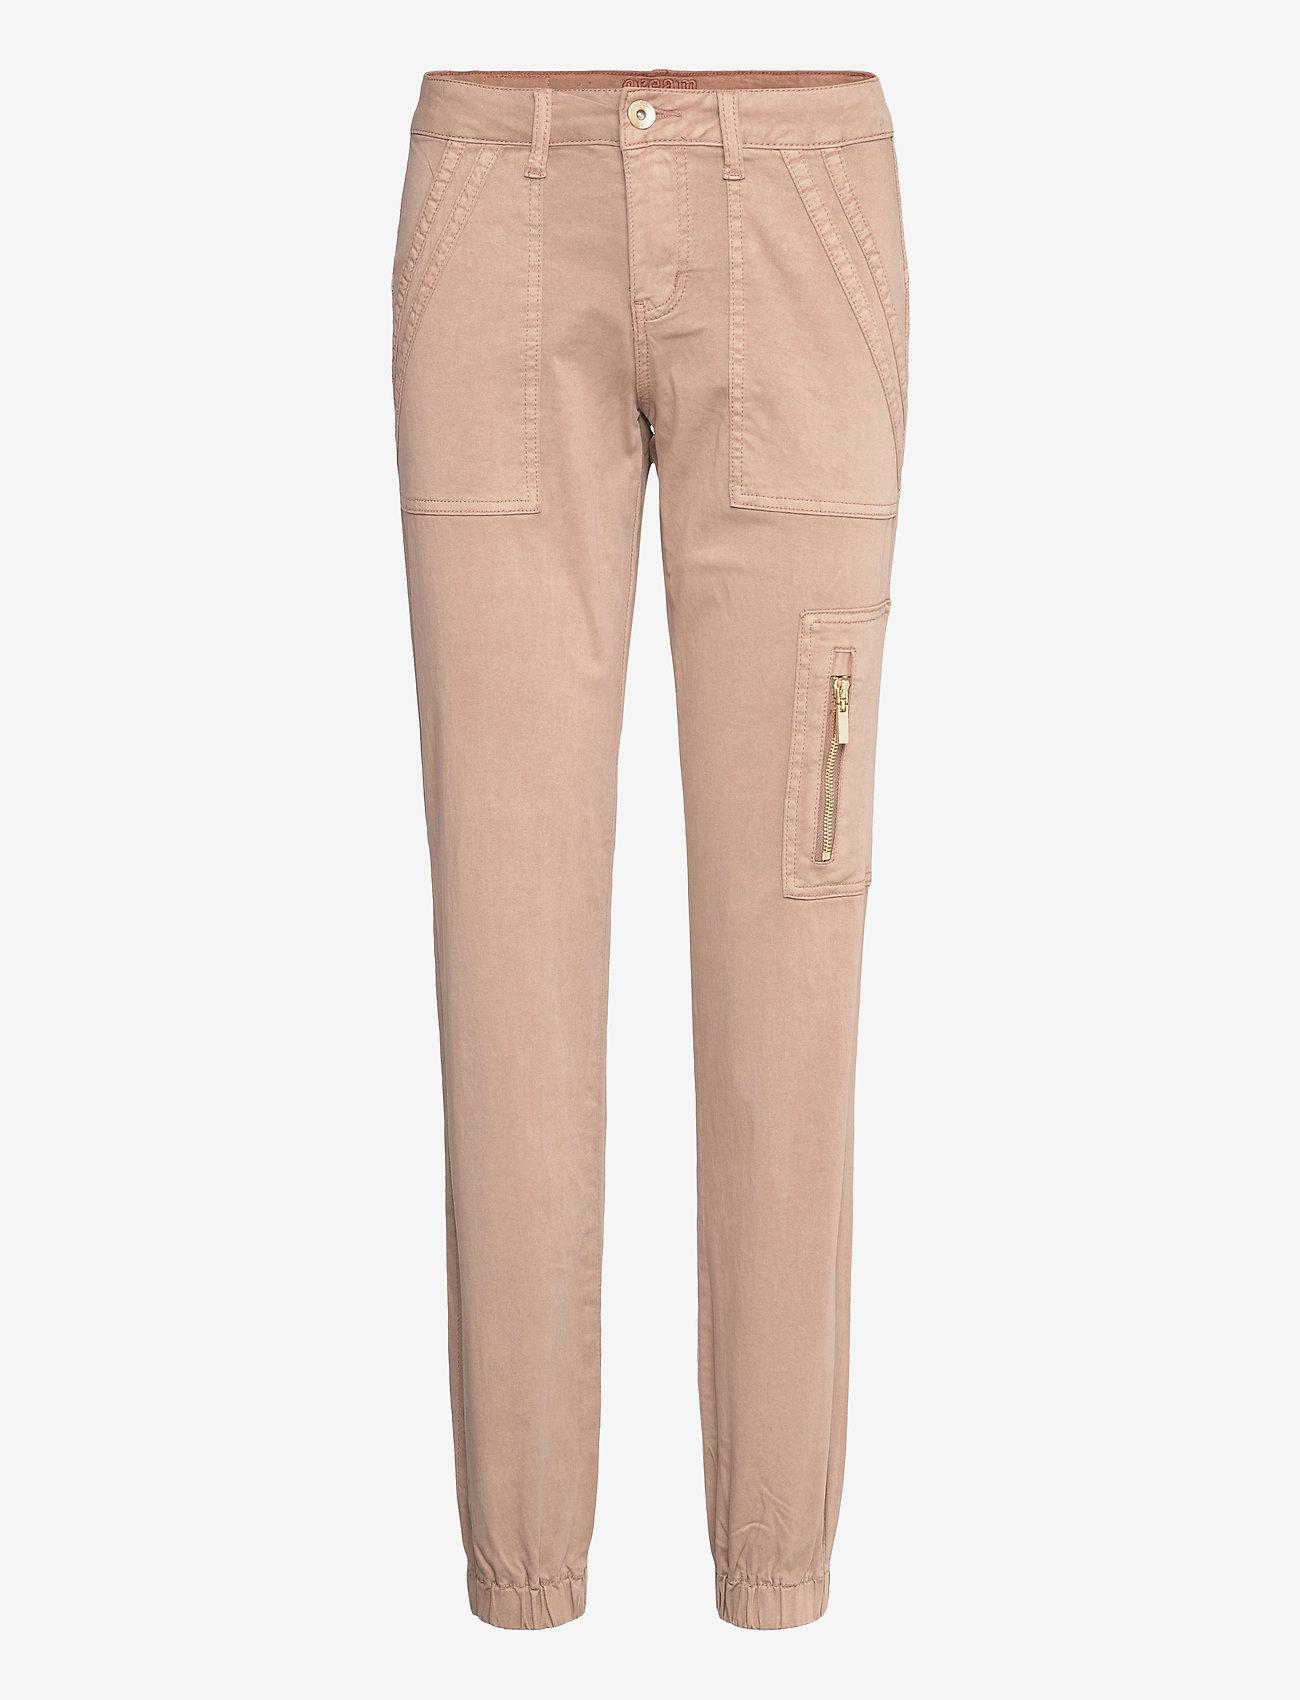 Cream - CRDafnie Jeans - Coco Fit - straight regular - cognac - 0